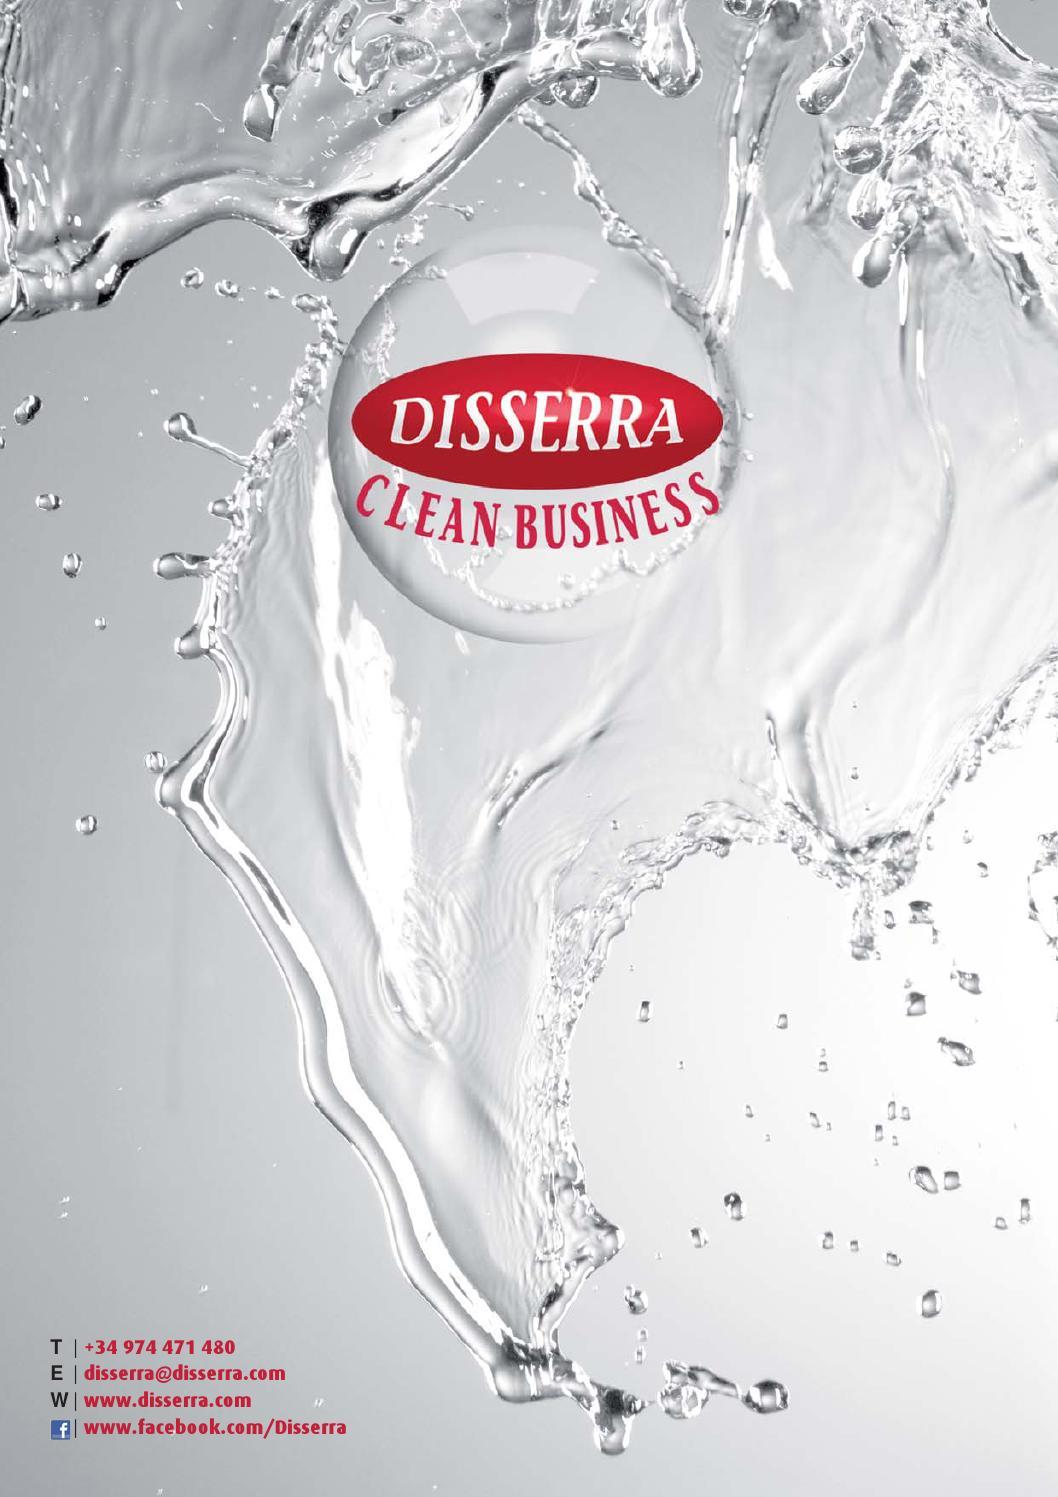 catalogo disserradisserra clean business - issuu